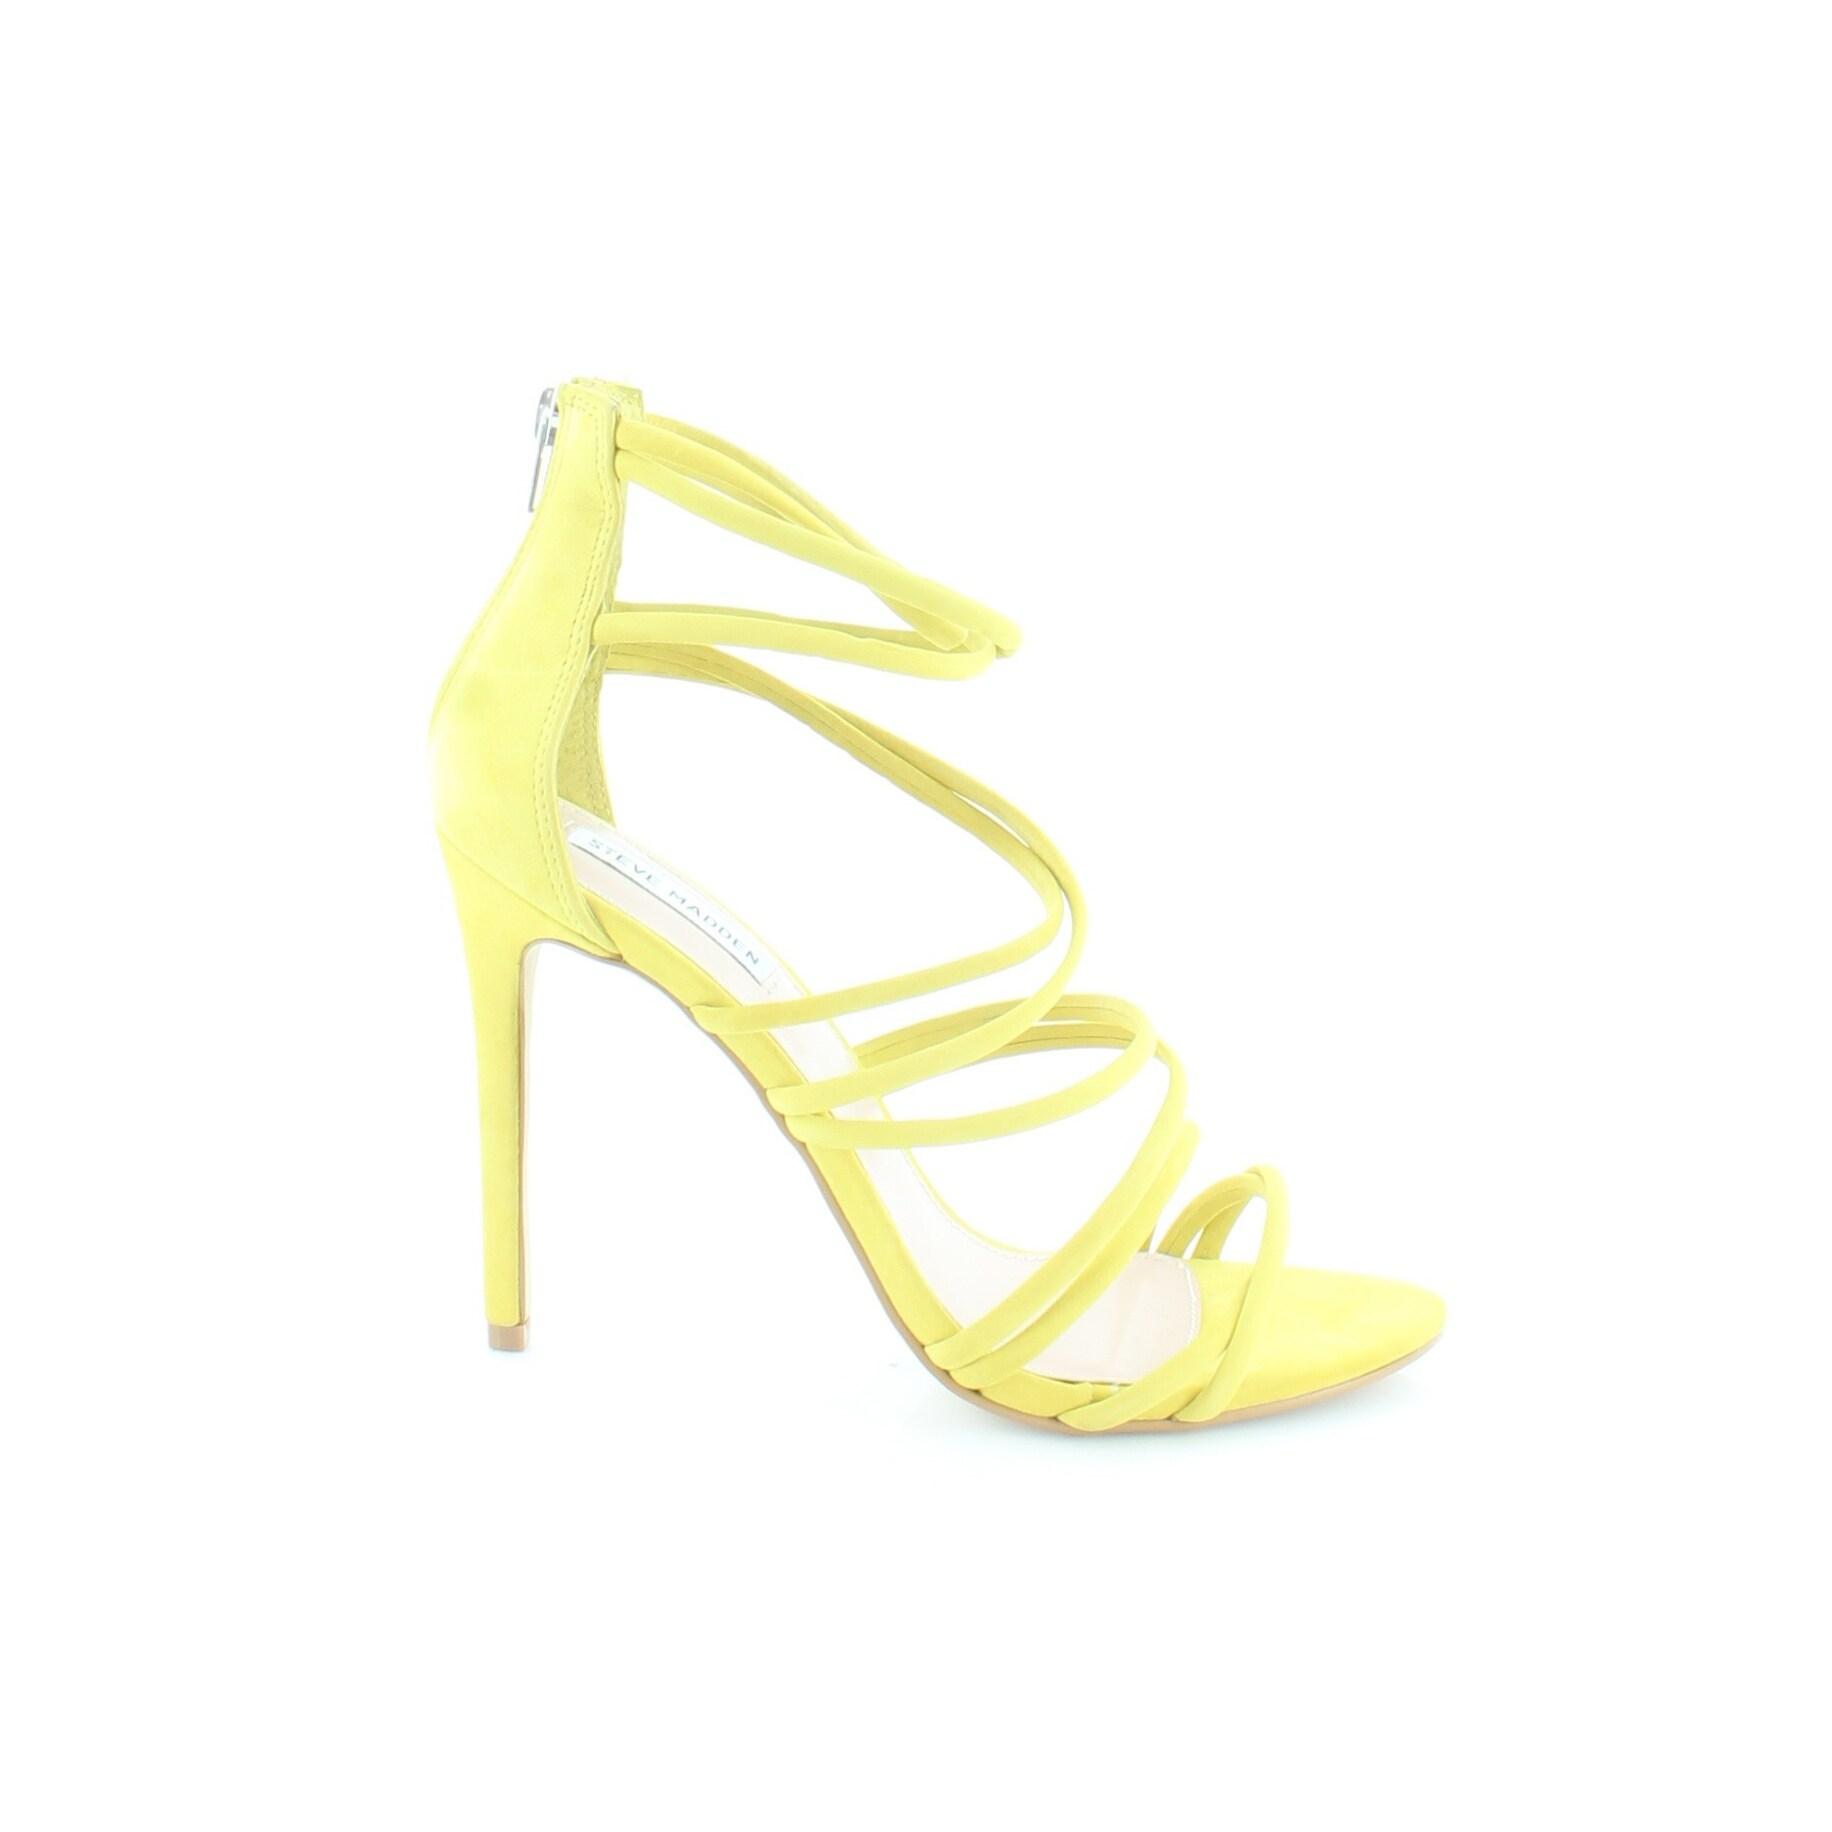 fe68f43acb5 Shop Steve Madden Santi Women's Heels Yellow - 10 - Free Shipping ...